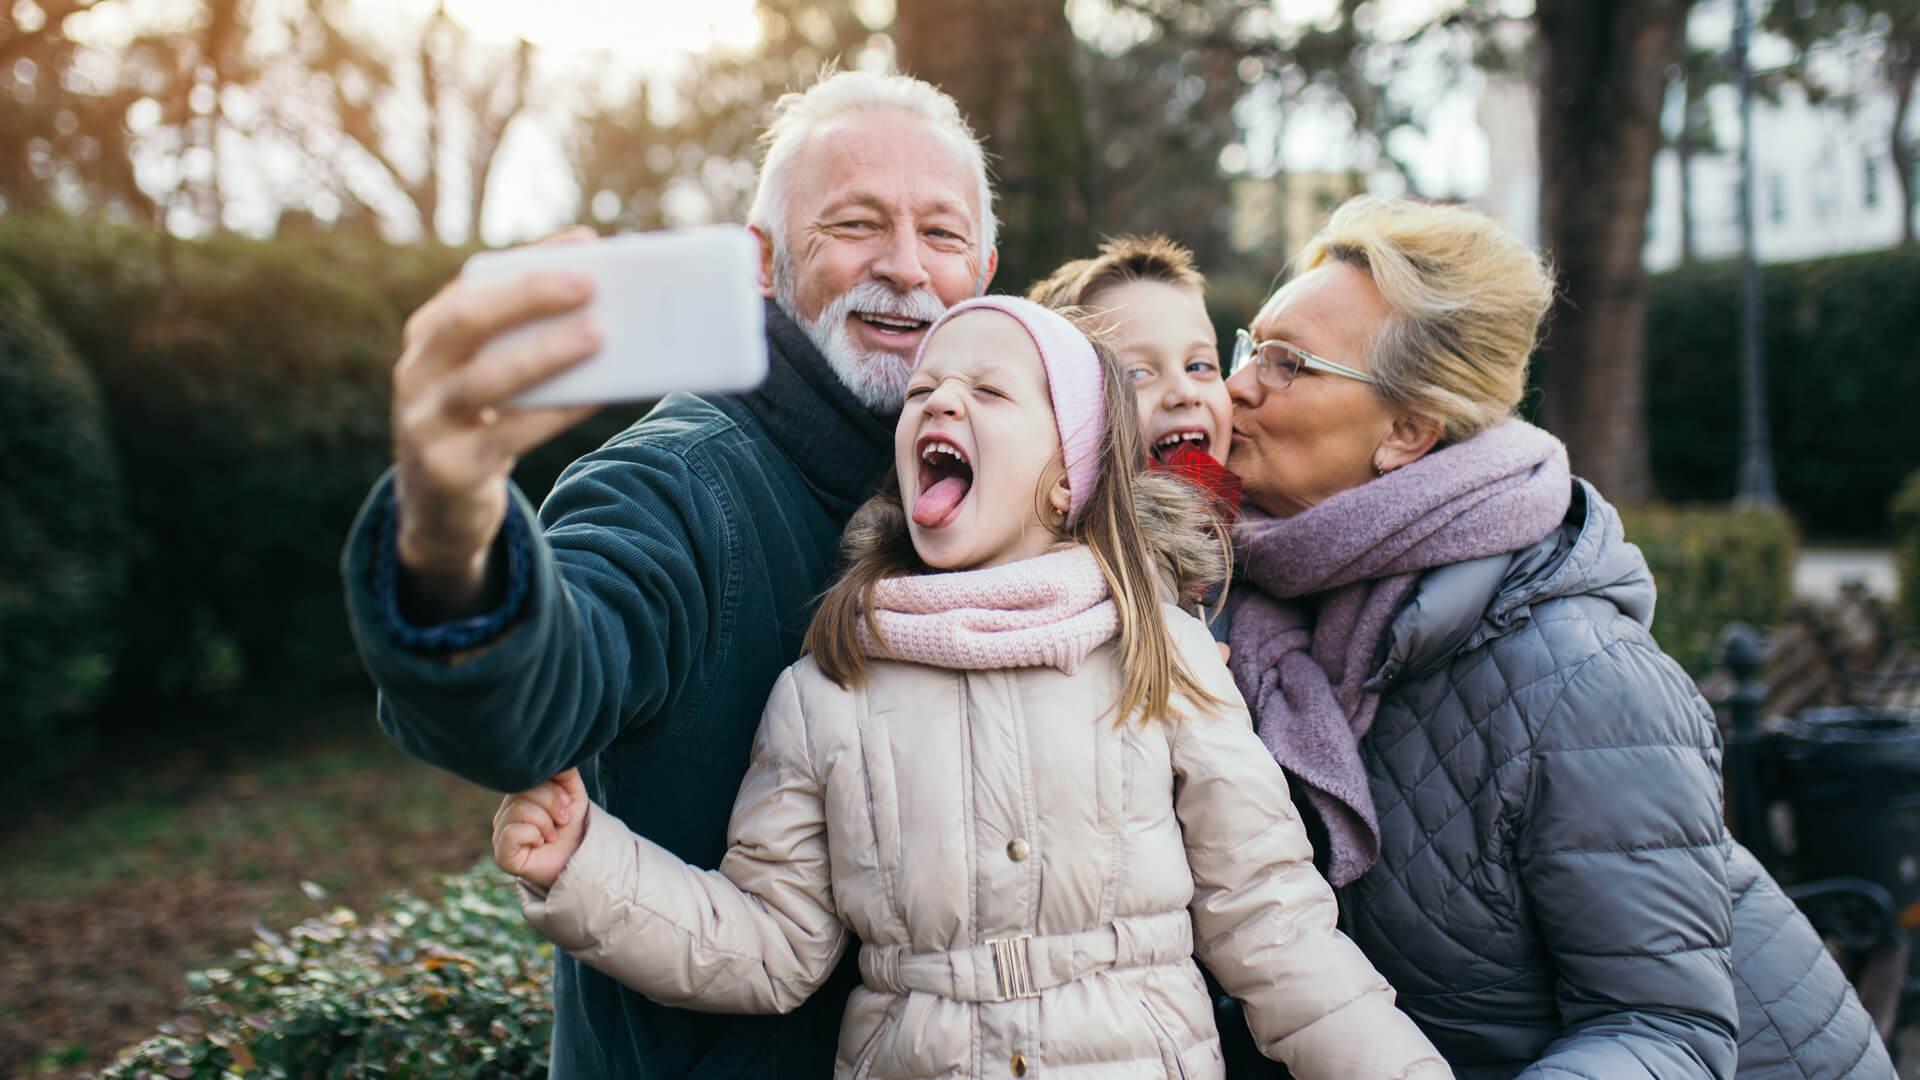 Retired grandparents taking a selfie with grandchildren